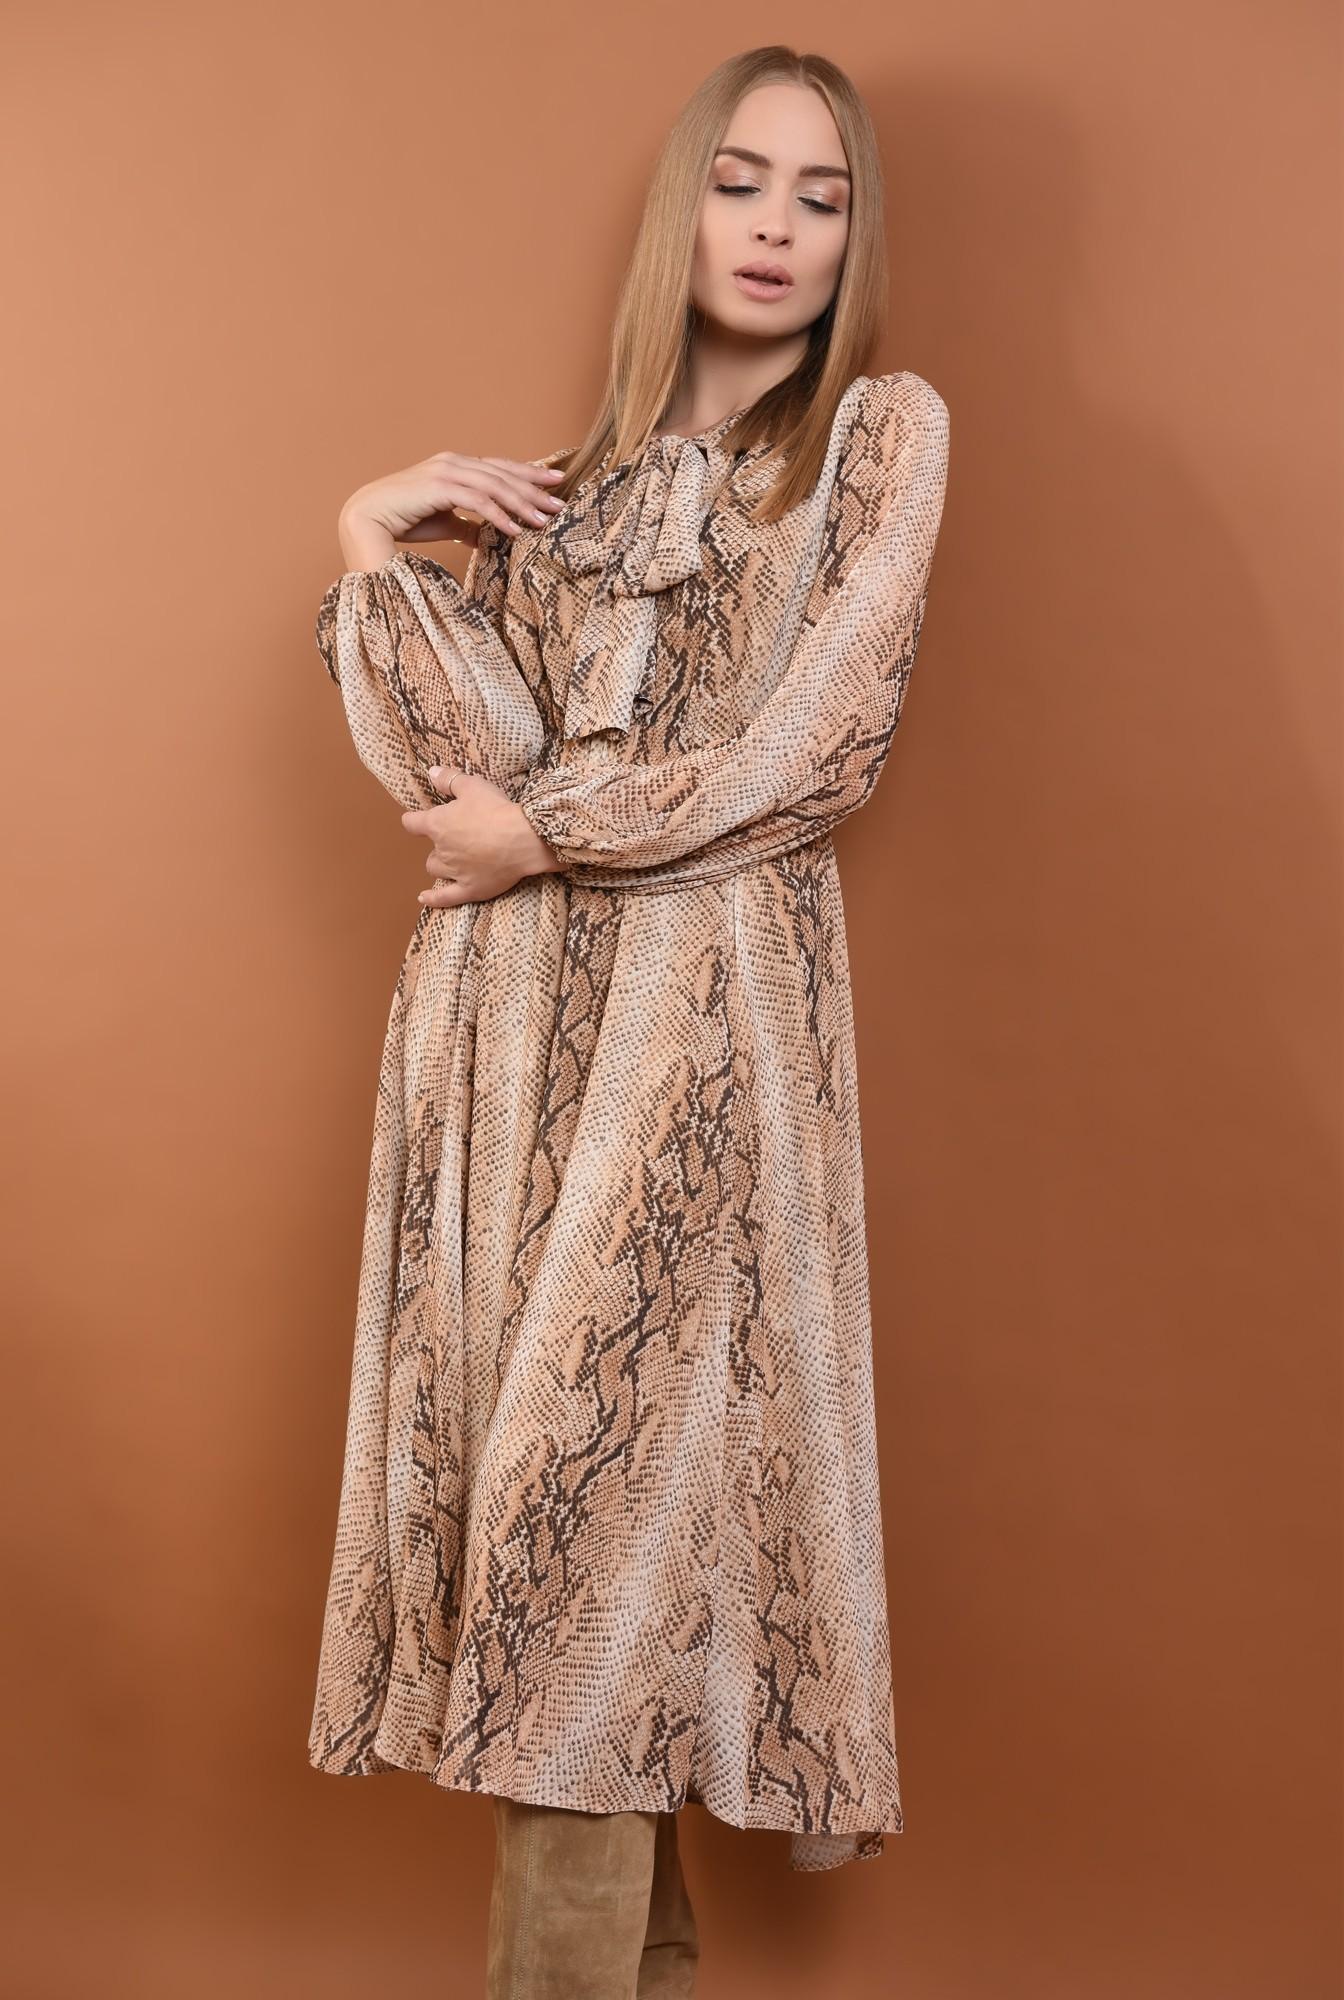 0 - 360 - rochie eleganta, de zi, din voal, imprimata, sarpe, maneci lungi, esarfa